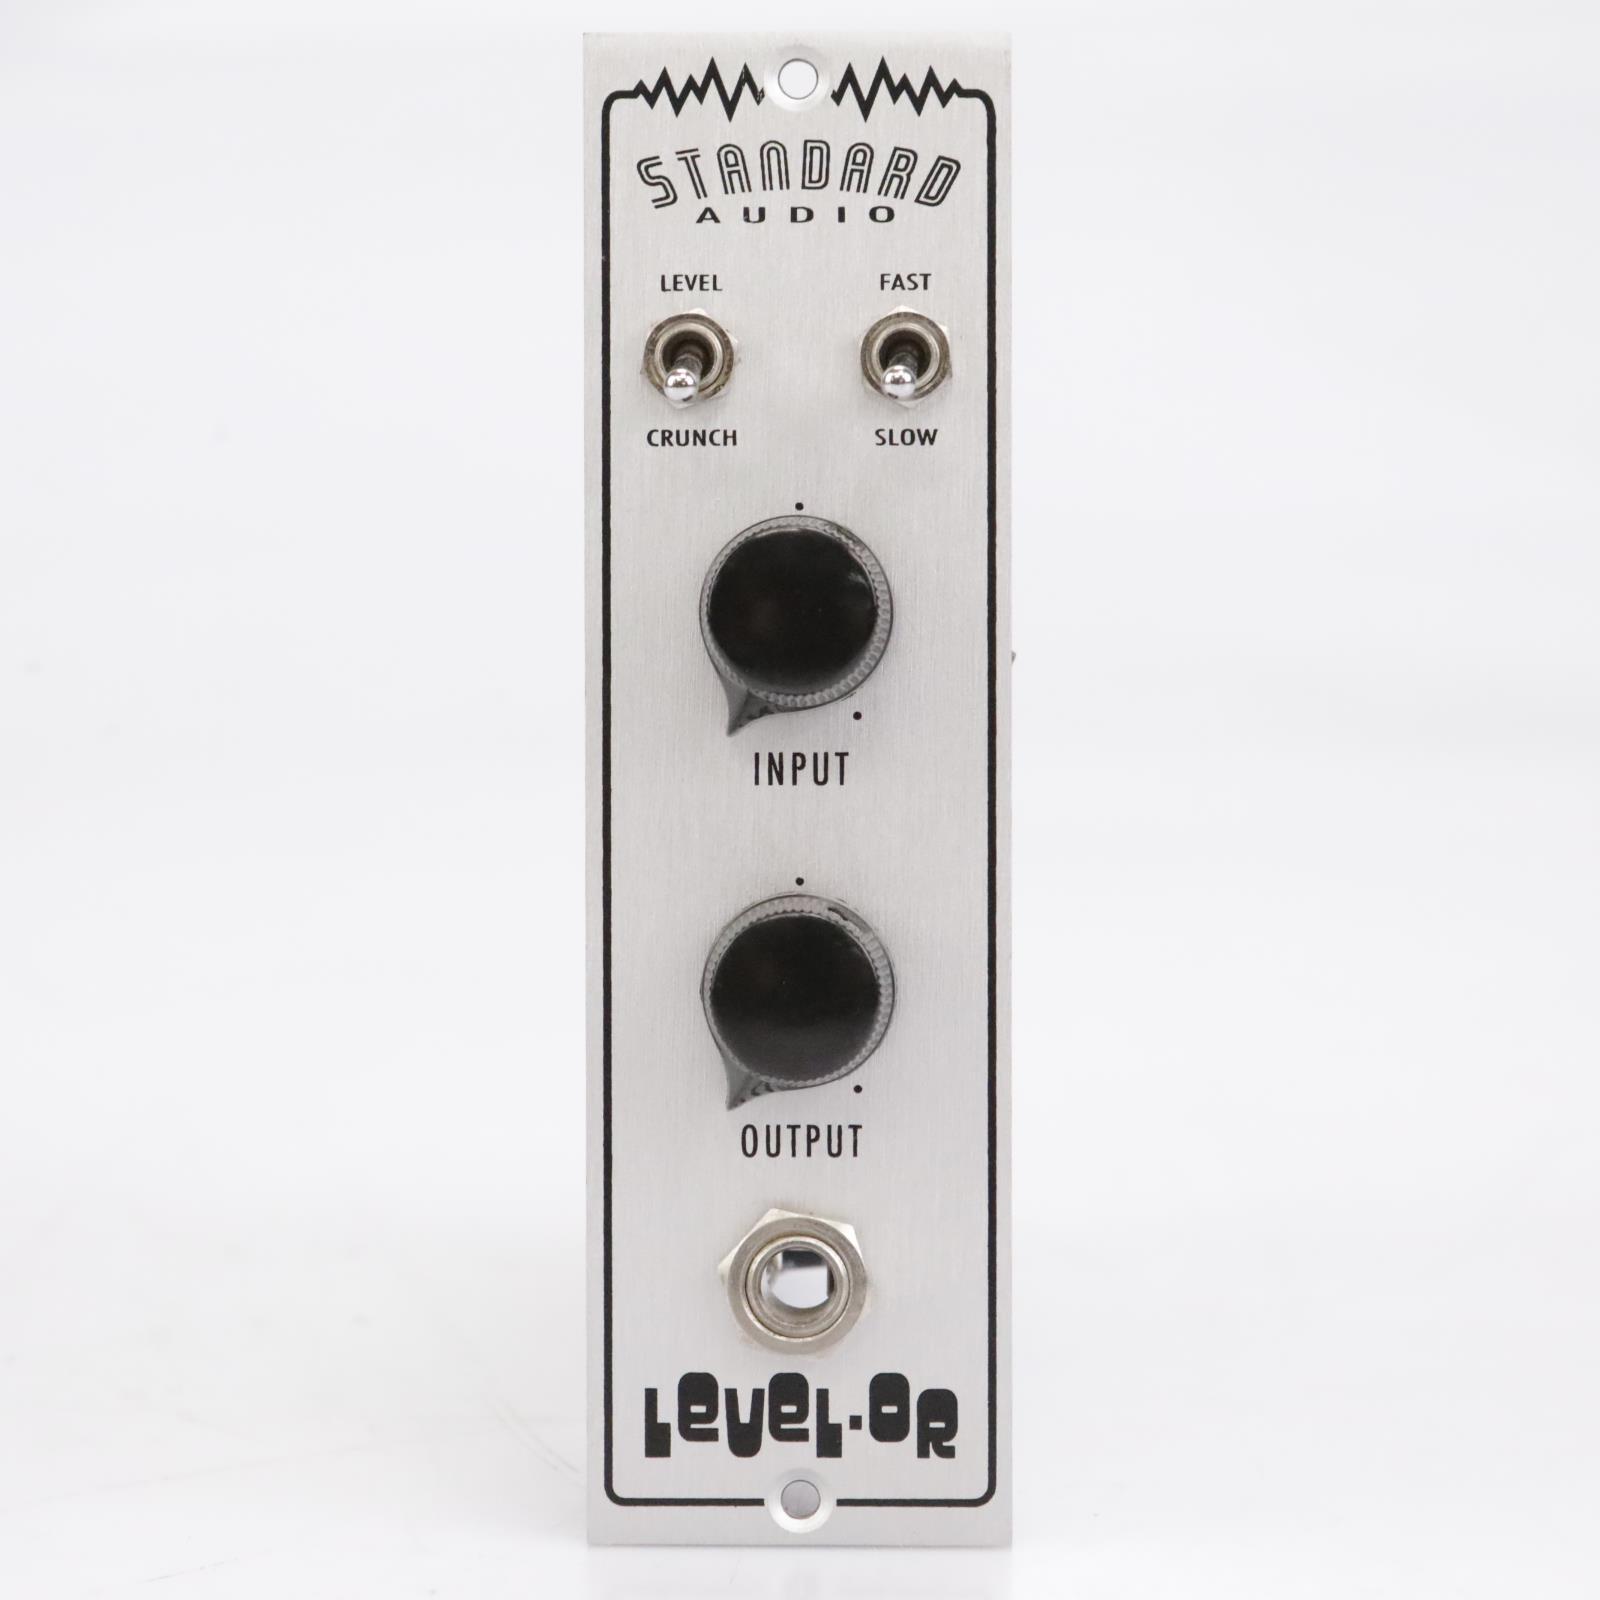 Standard Audio Level-Or 500 Series Limiter Module #43567